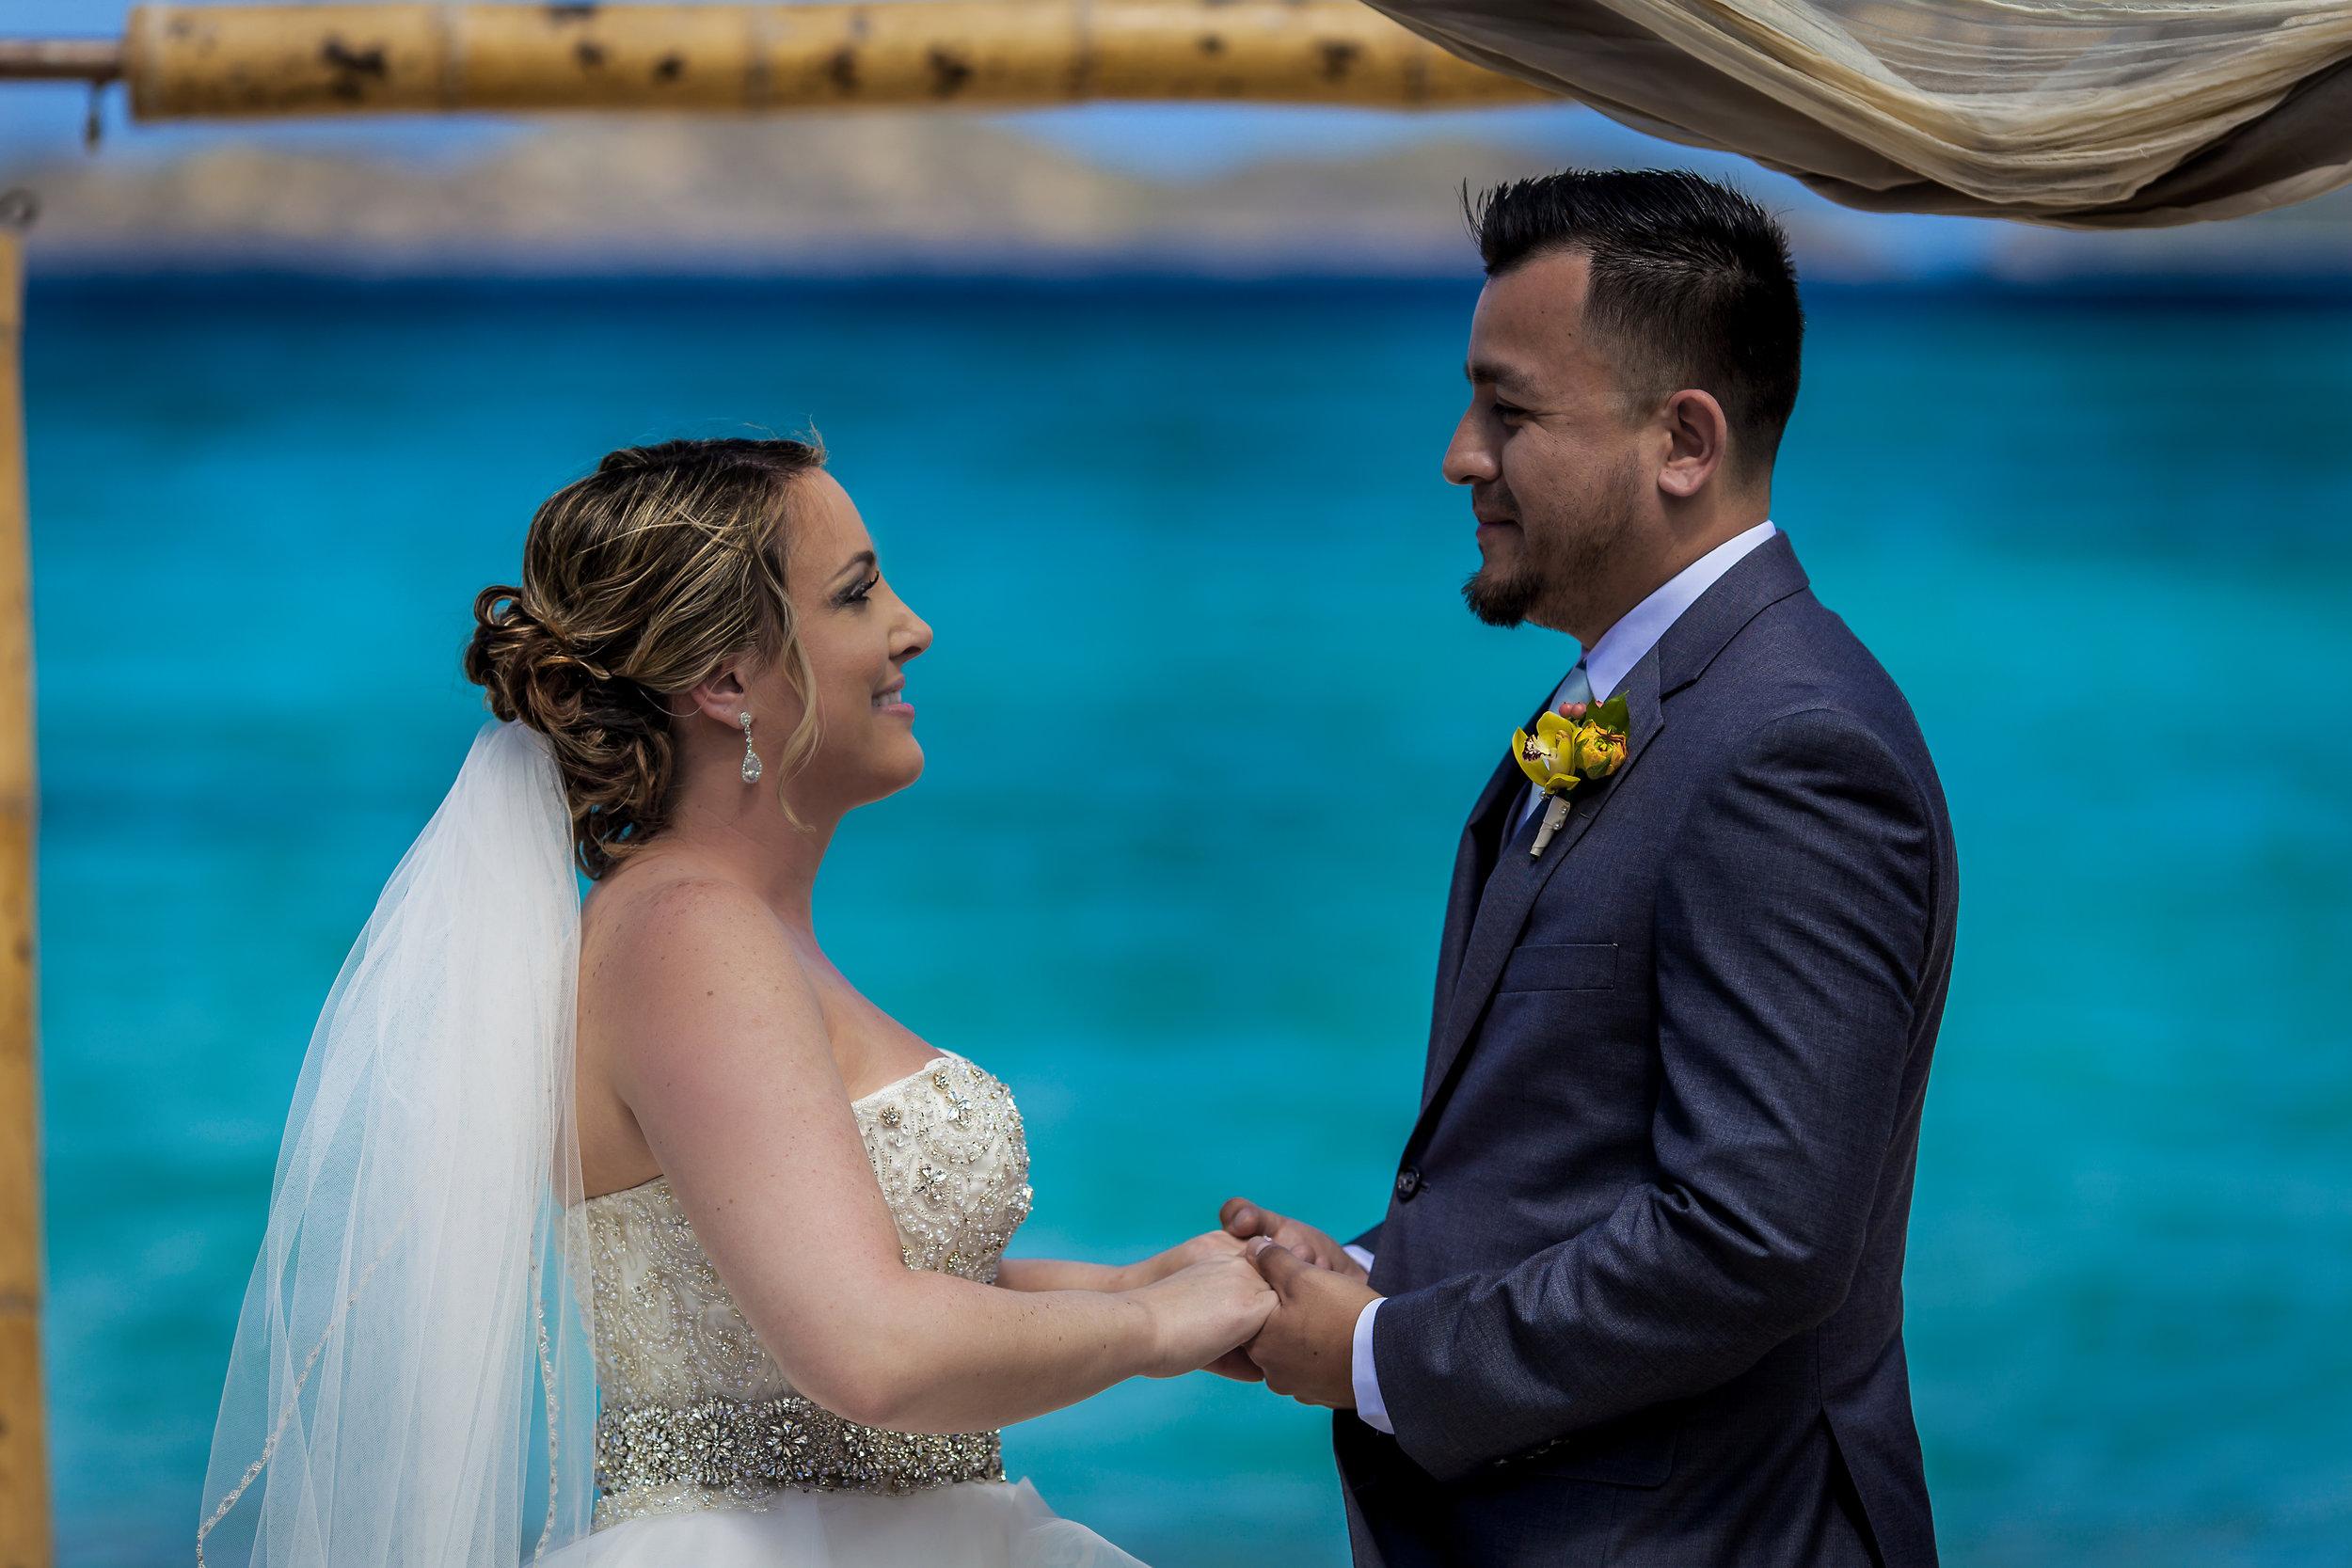 St. Thomas Destination Wedding - Eleny + Enrique